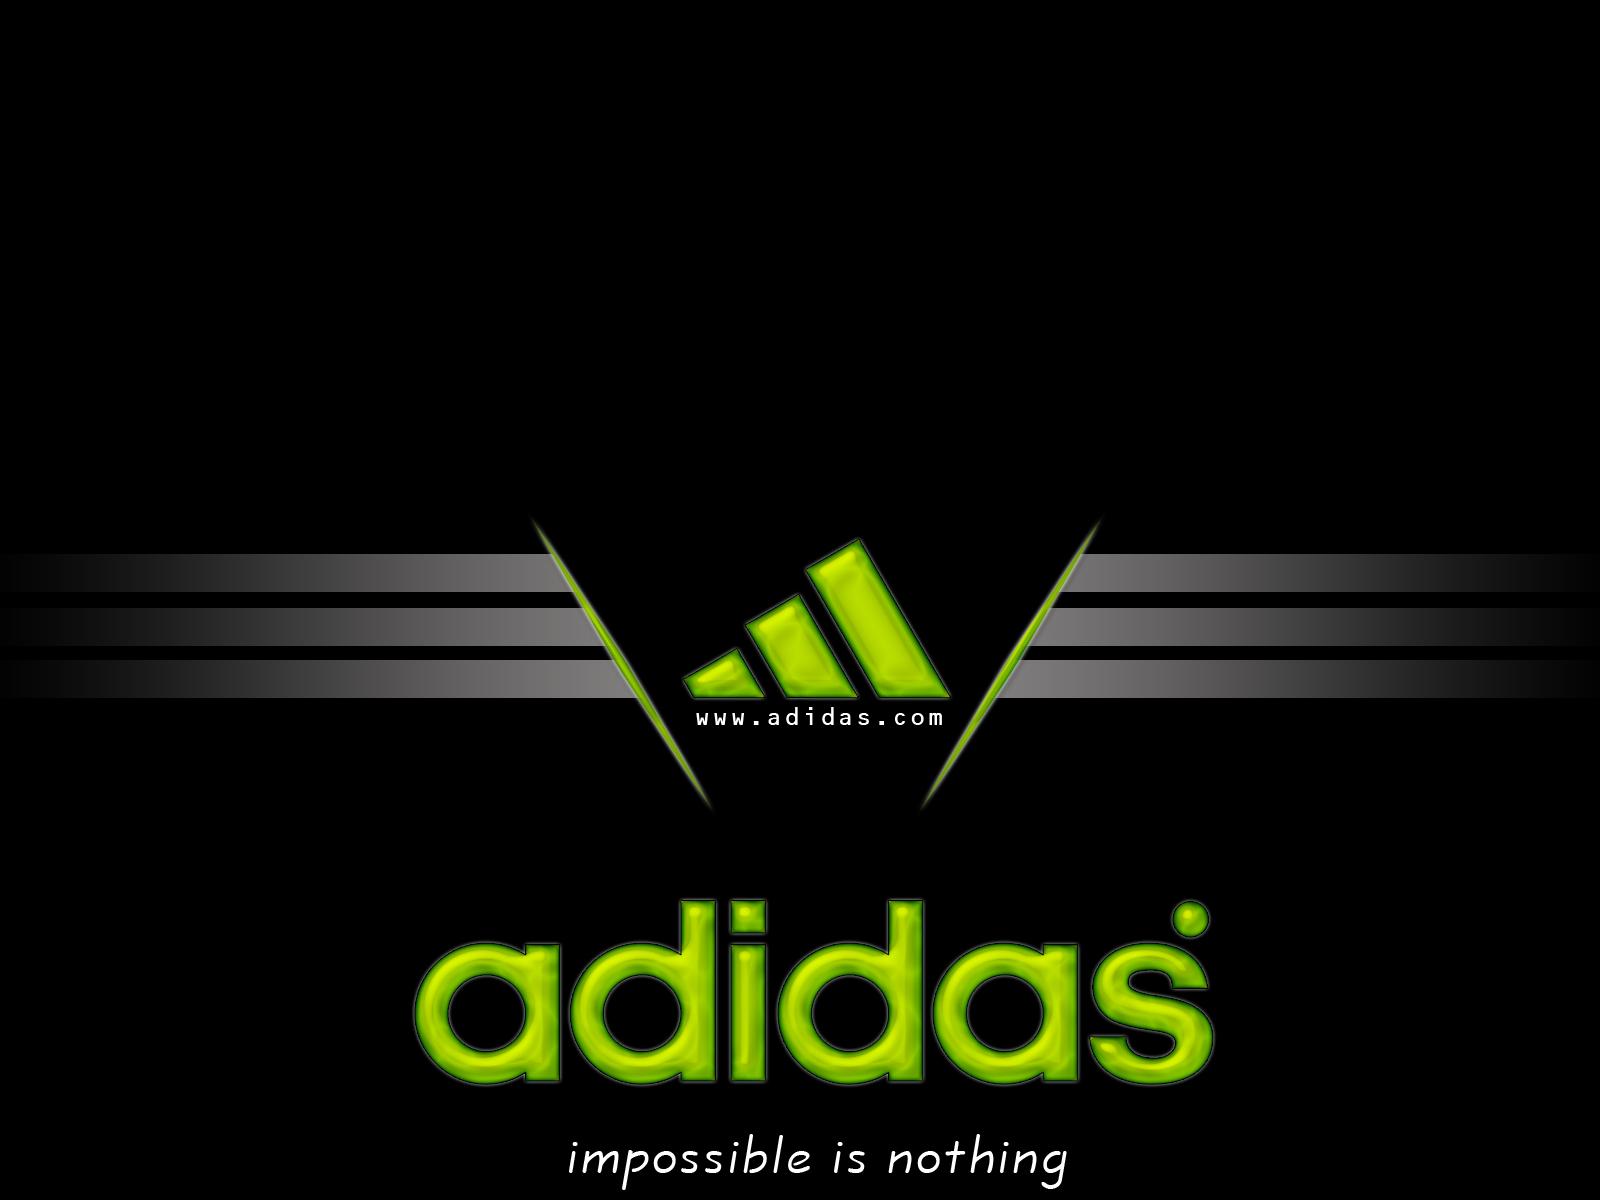 New HD Adidas Logo Wallpaper 1600x1200